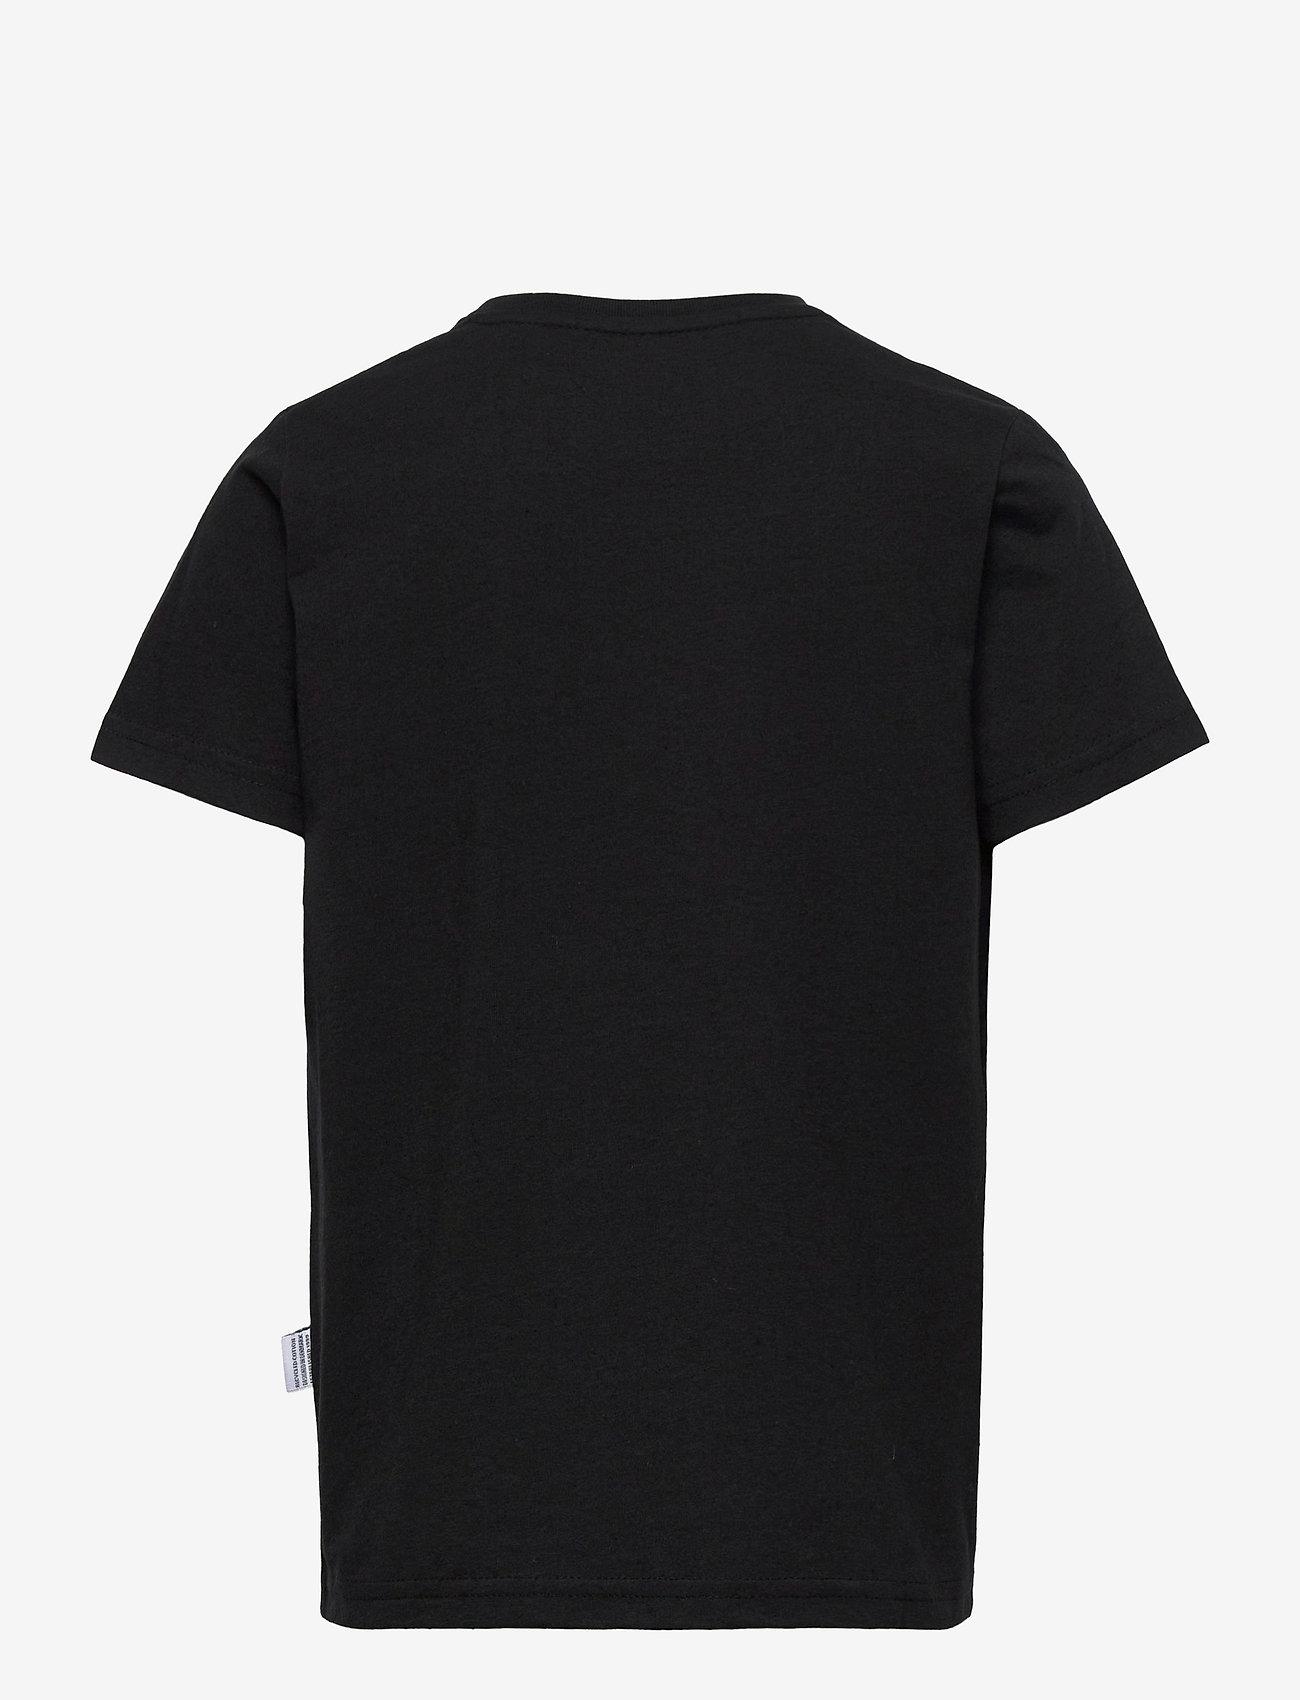 Kronstadt - Timmi Recycled - short-sleeved - black - 1